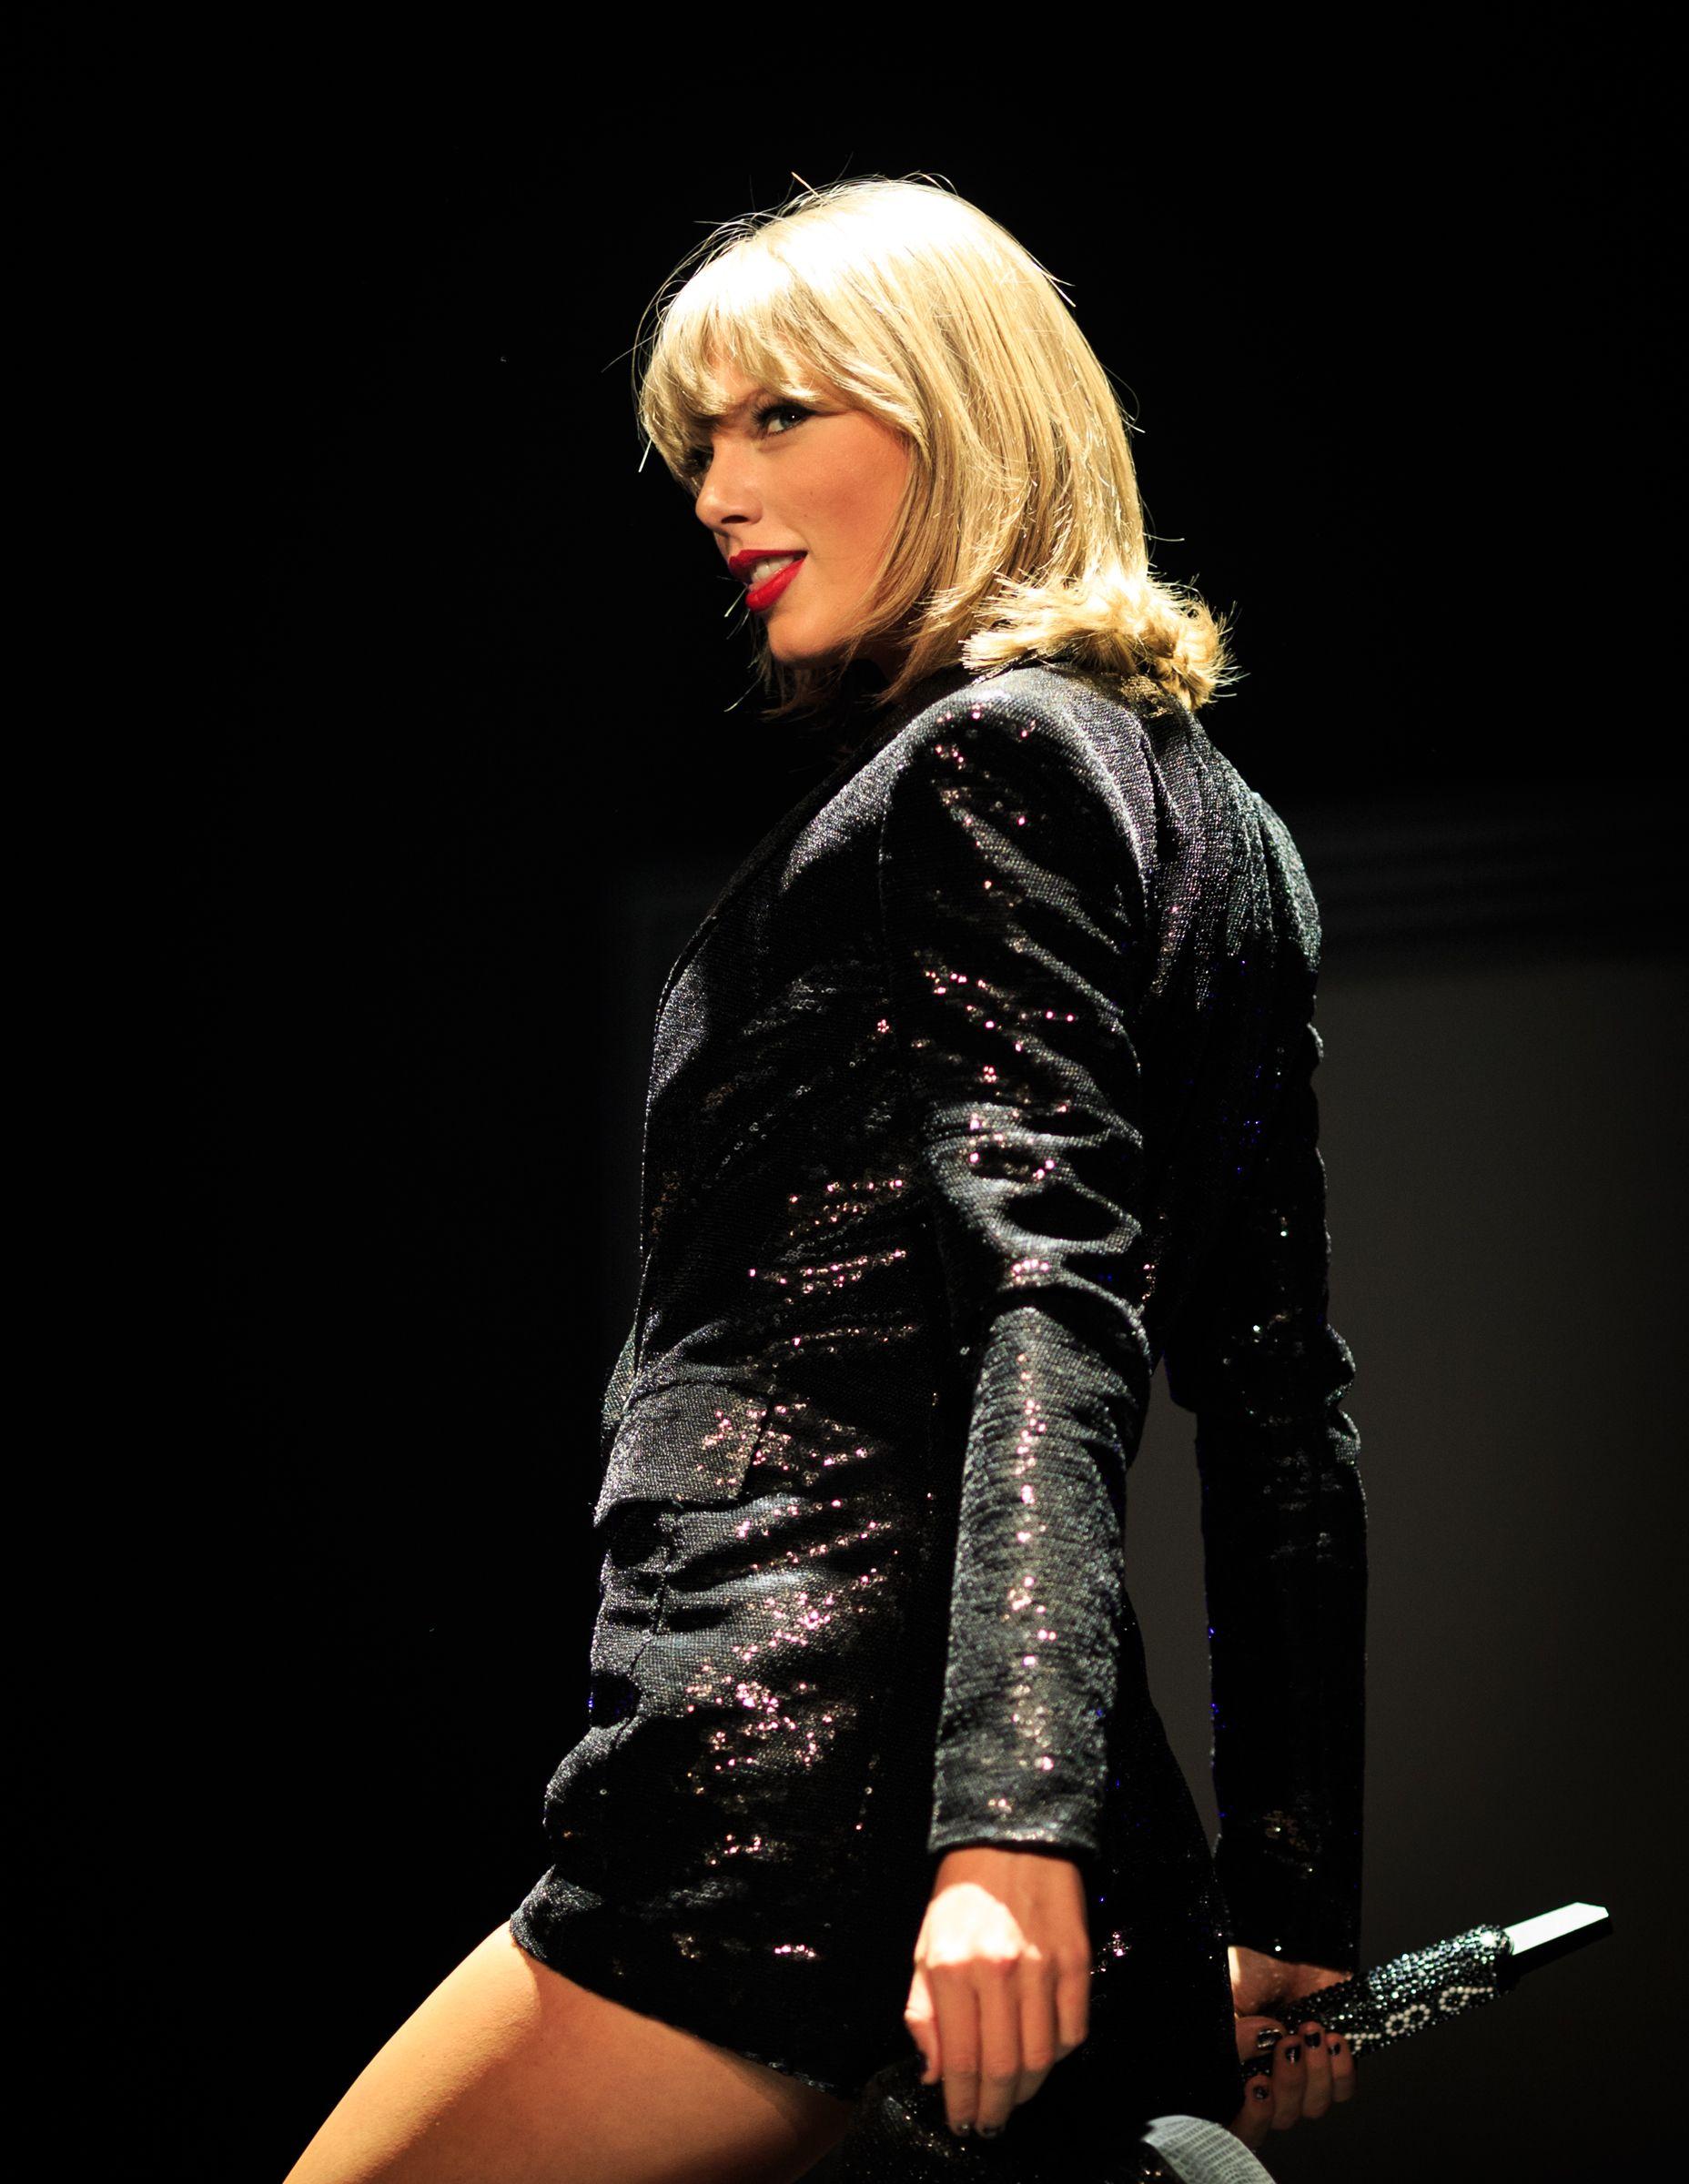 Taylor Swift Just Brought Ellen Degeneres Onstage For Her 1989 Tour